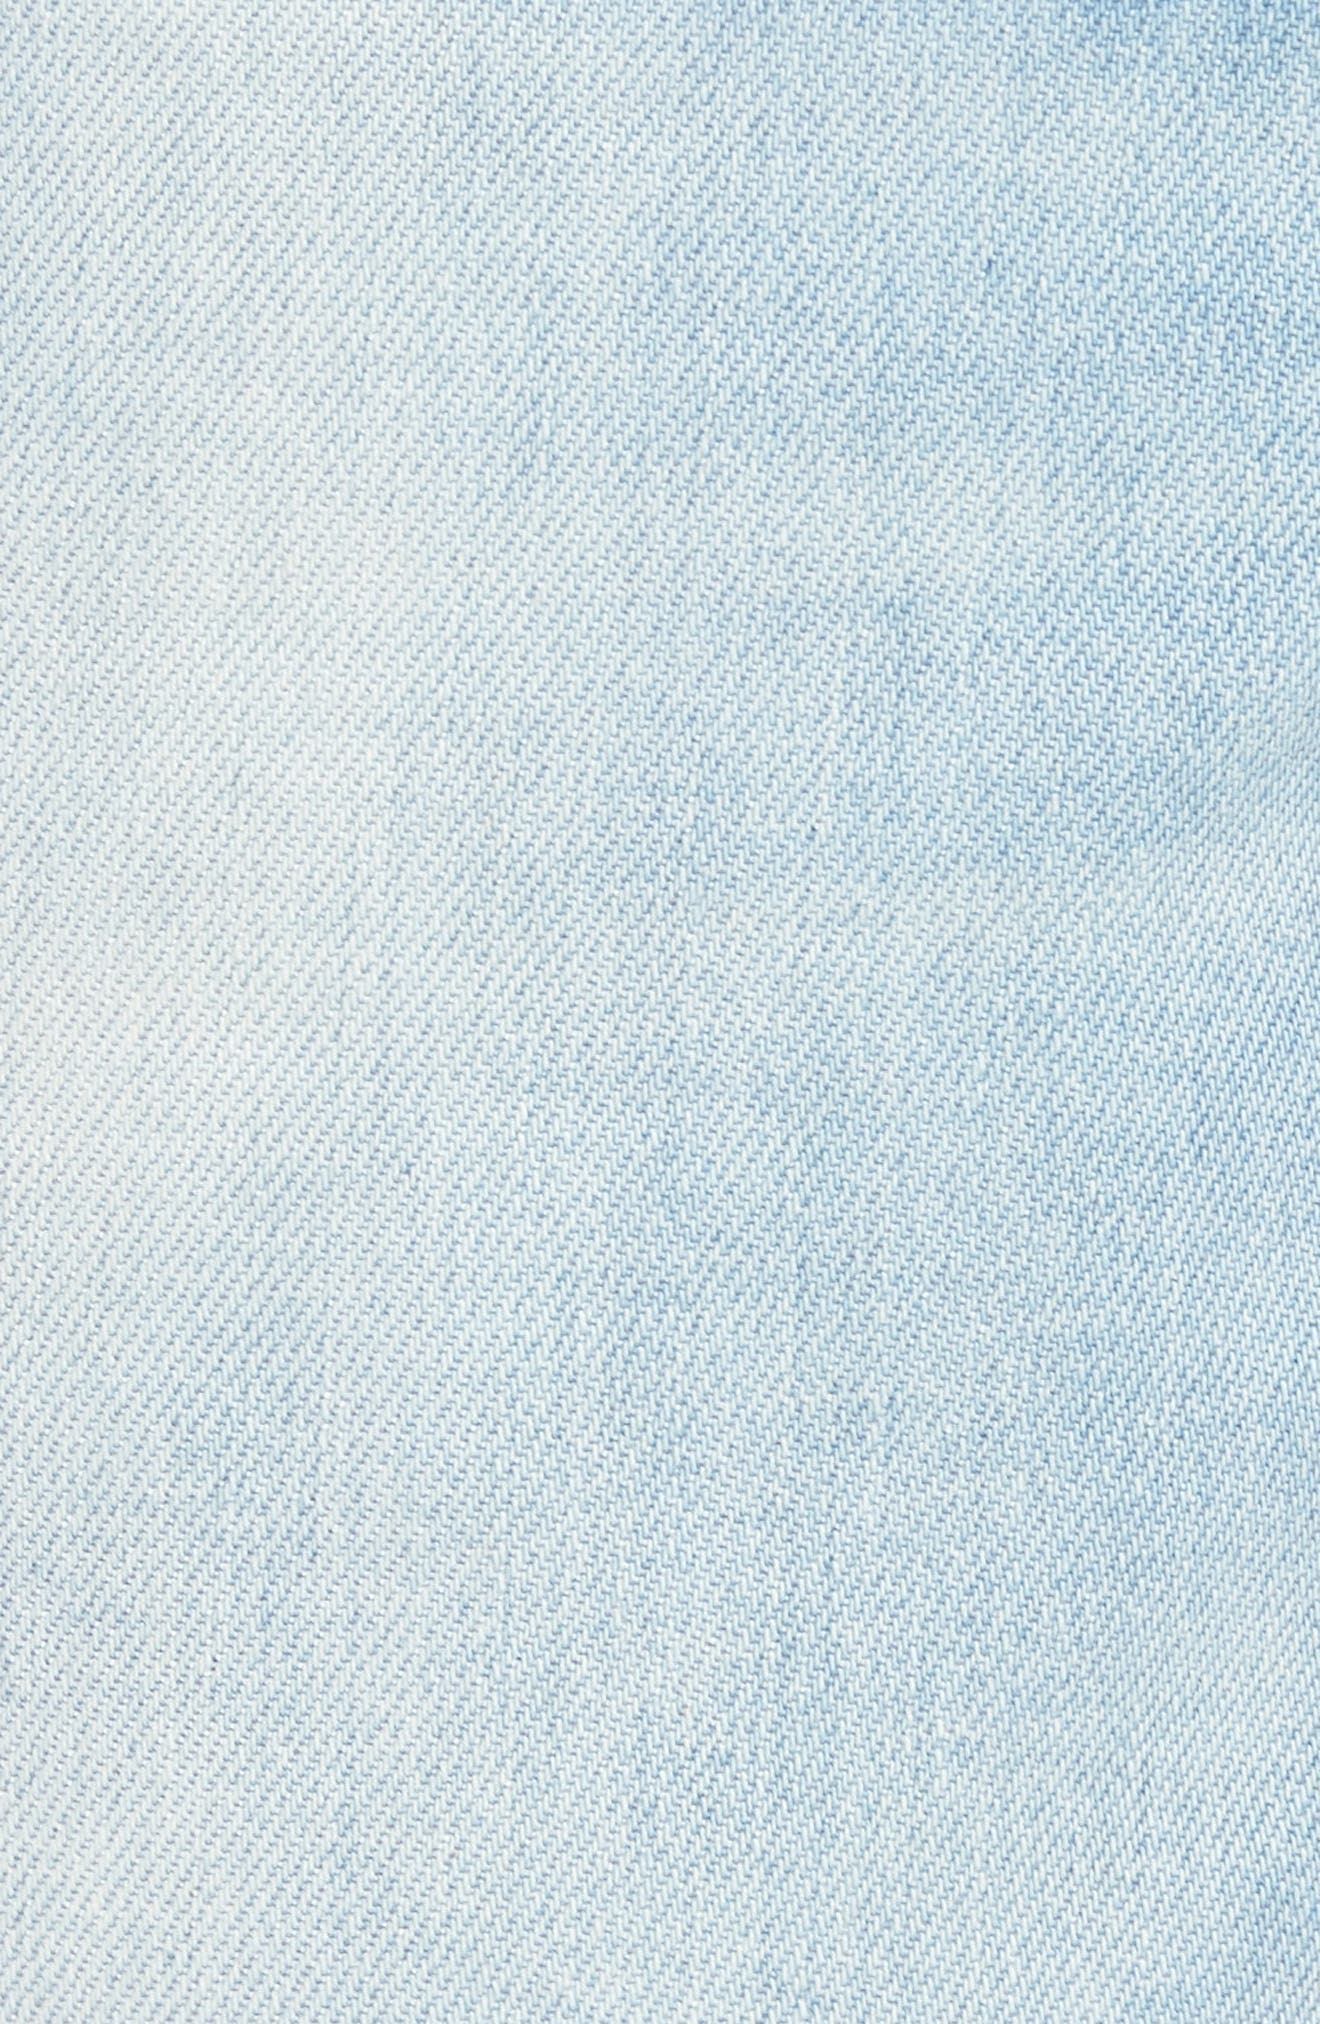 Blake Slim Fit Jeans,                             Alternate thumbnail 5, color,                             Rewired